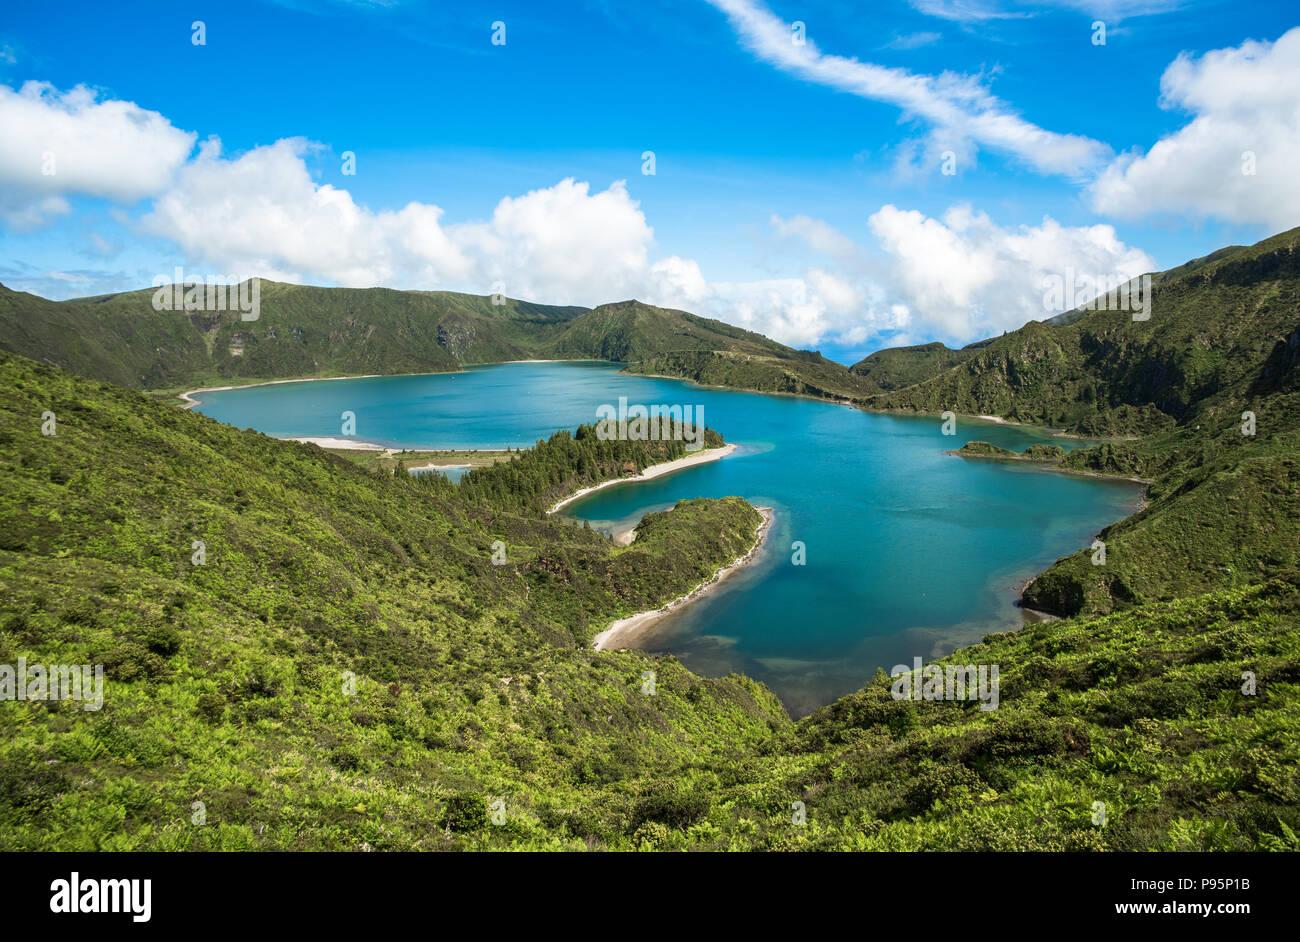 Panoramablick auf Fogo See in Sao Miguel, Azoren, Portugal Stockbild